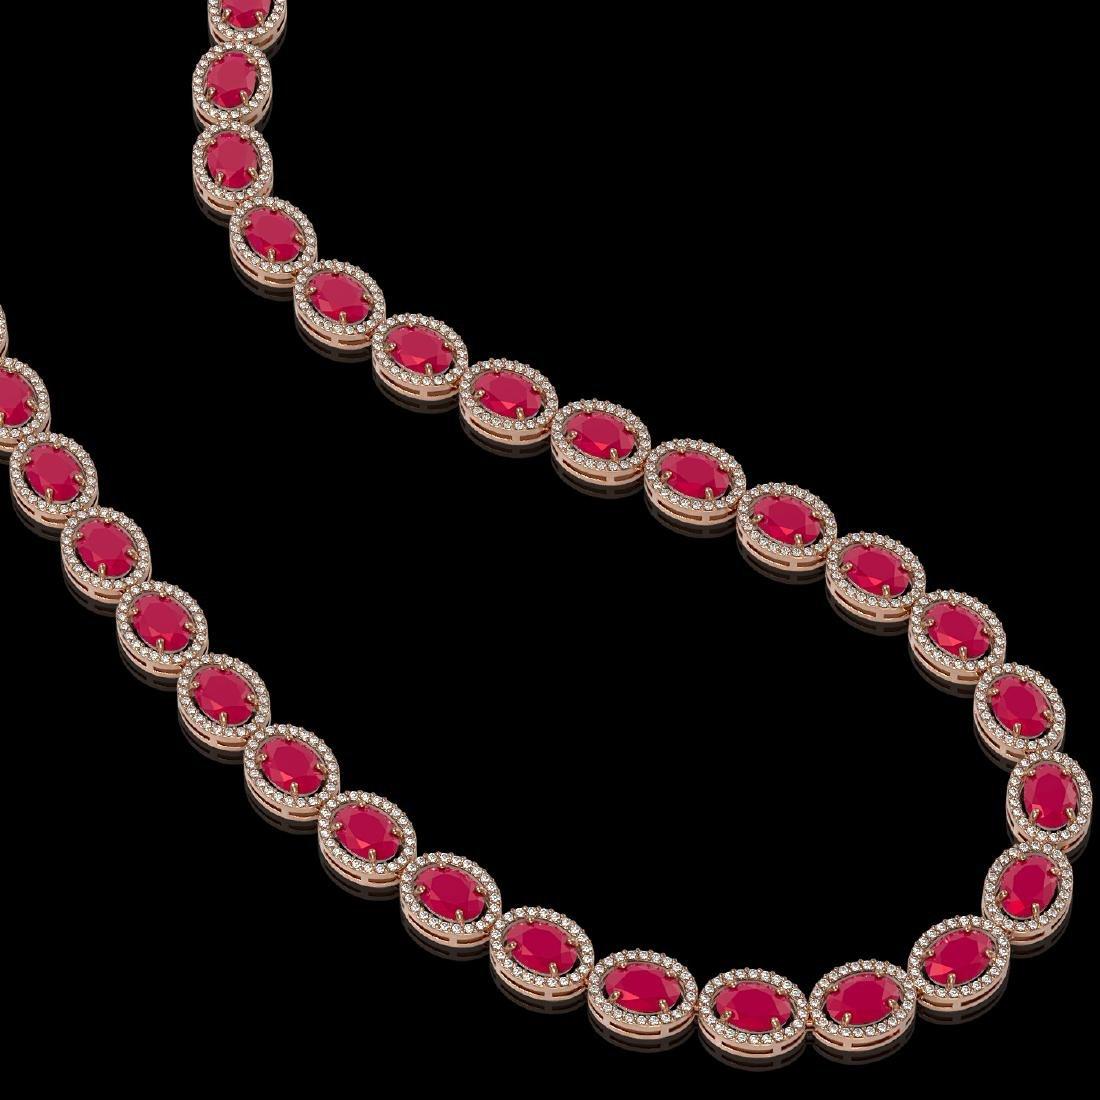 52.15 CTW Ruby & Diamond Halo Necklace 10K Rose Gold - 2